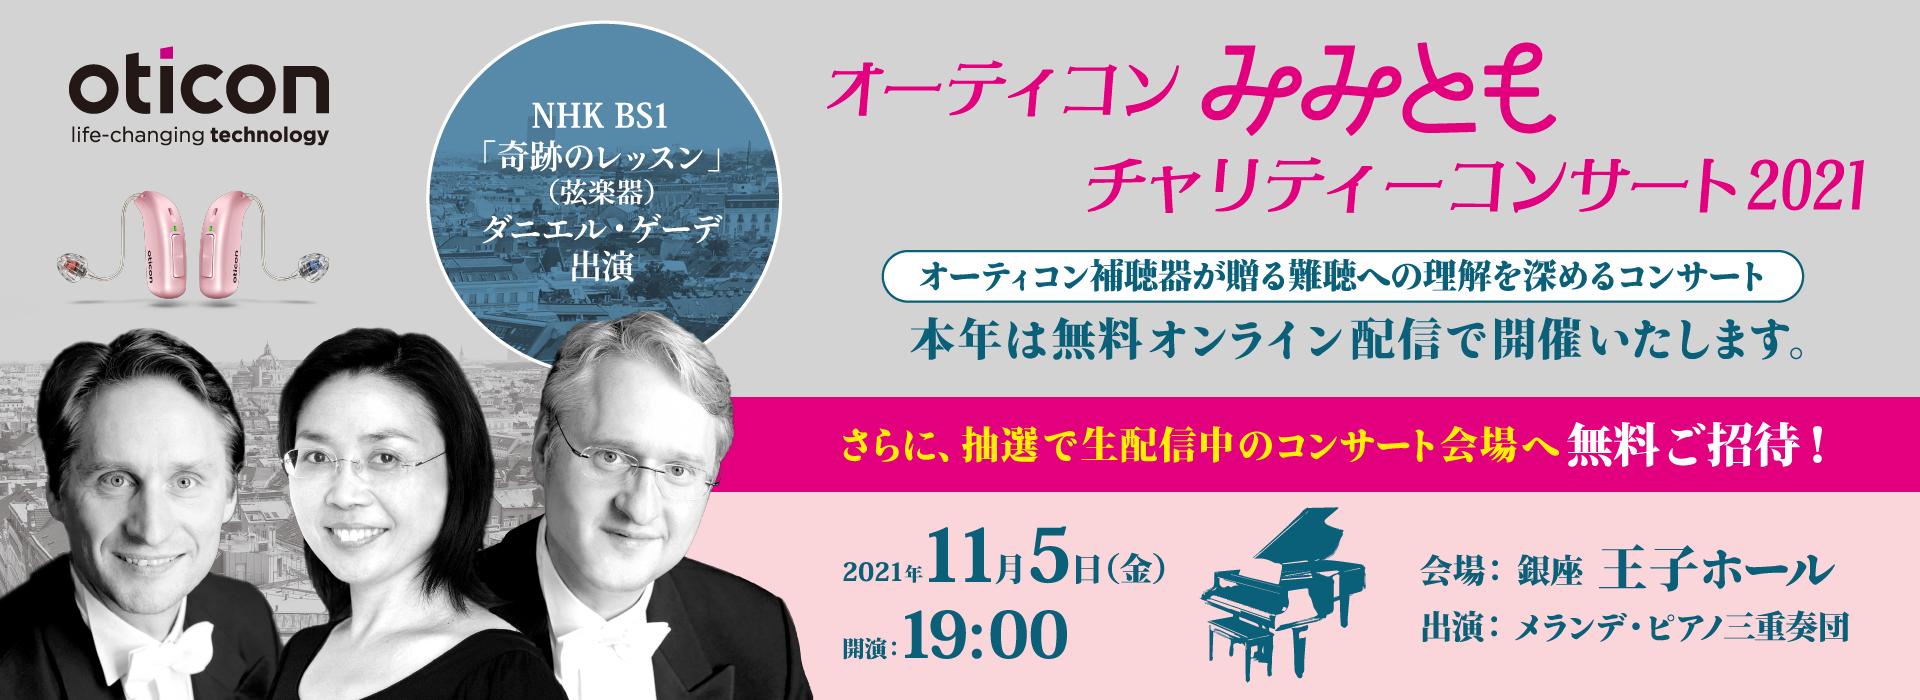 mimitomo-concert_210914_1920x700